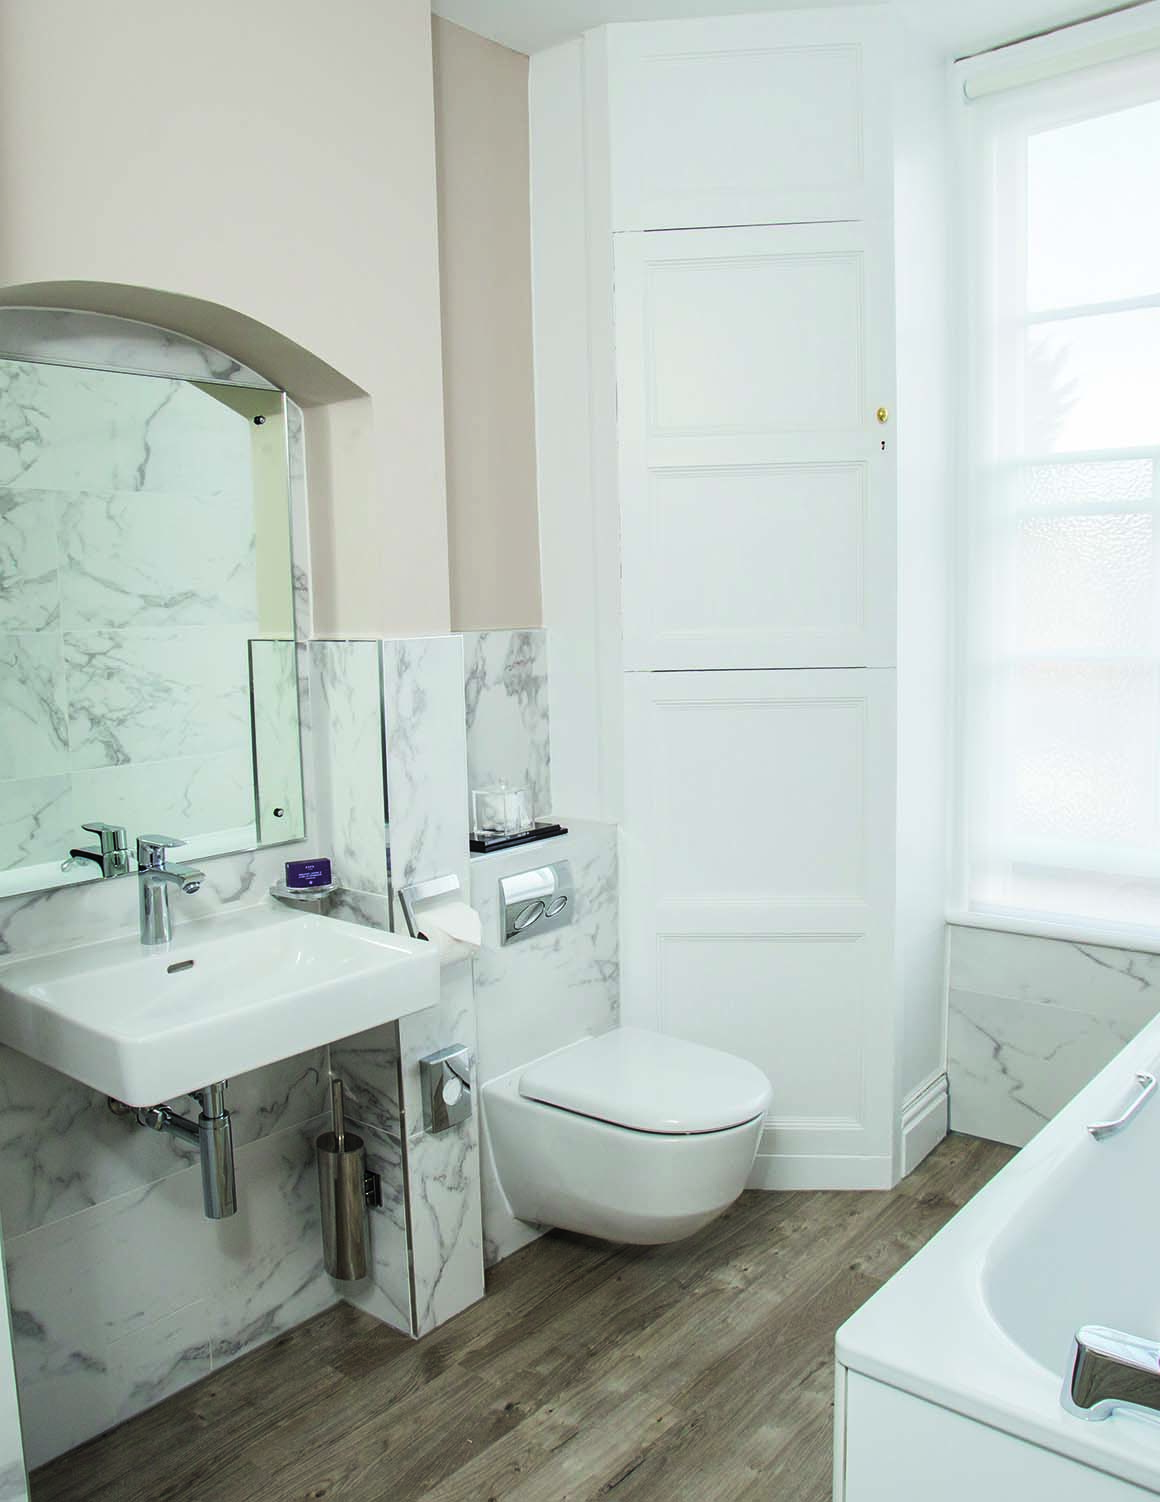 Arden House Hotel Photo Gallery bathroom